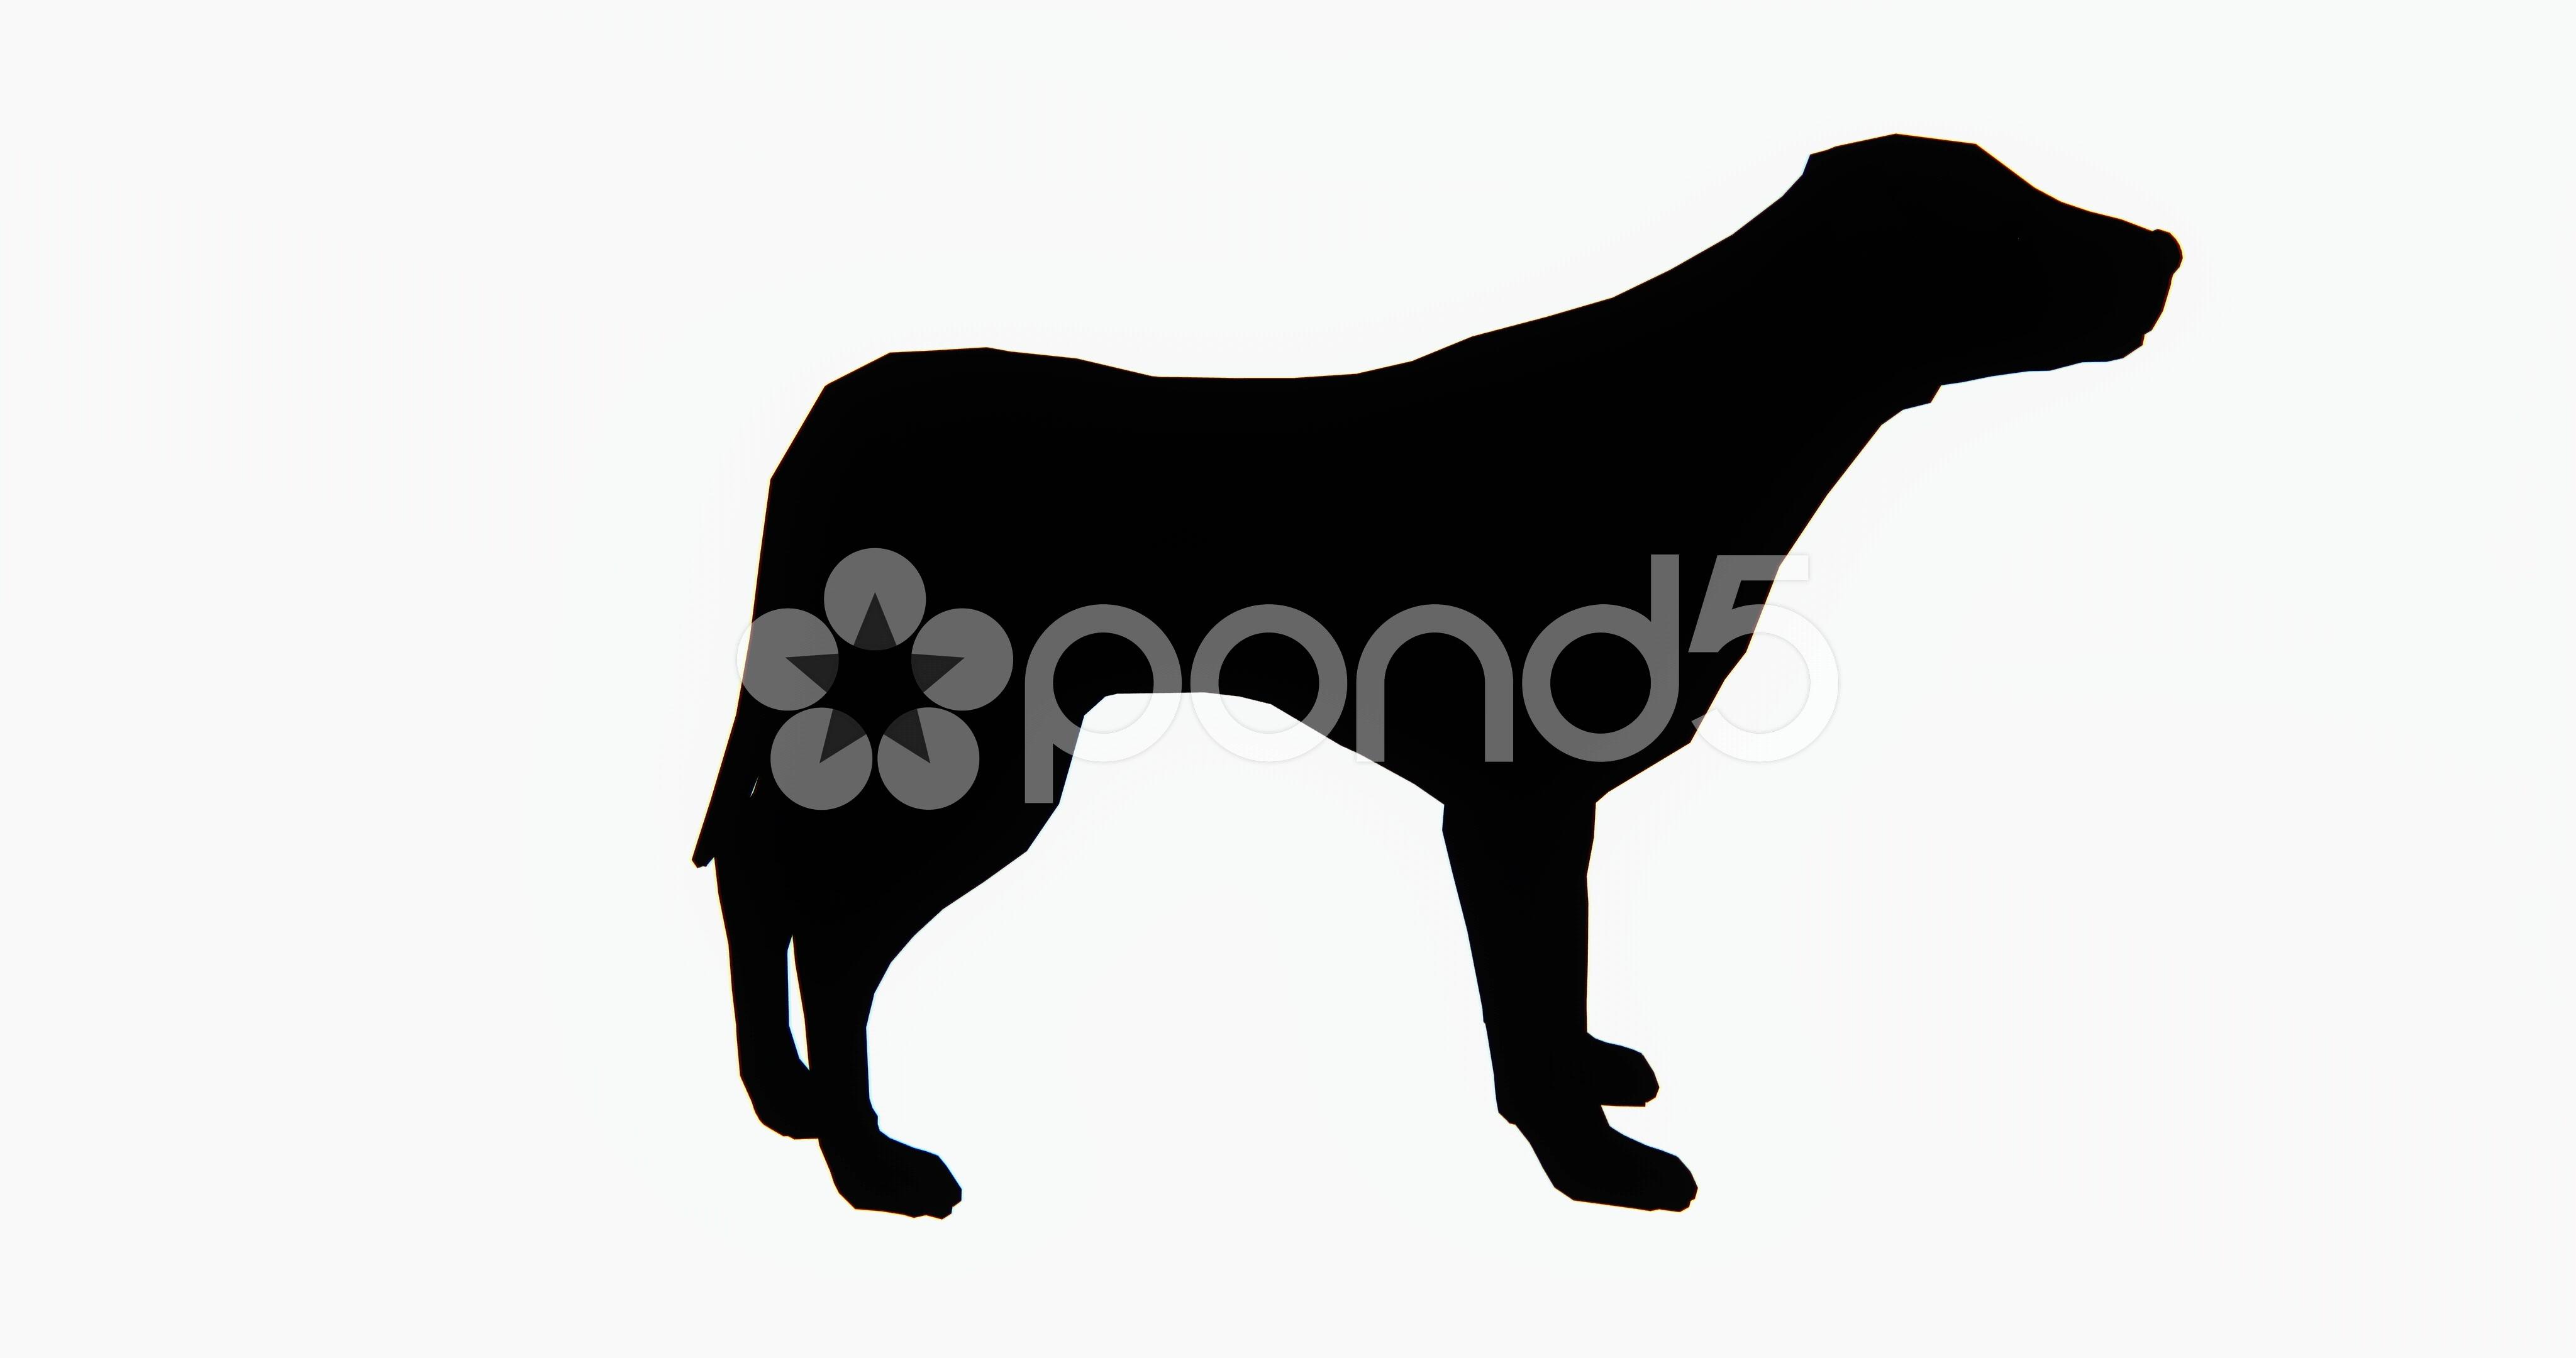 4096x2160 Video 4k Dog,3d Cartoon,lovely Pet,animal Silhouette. ~